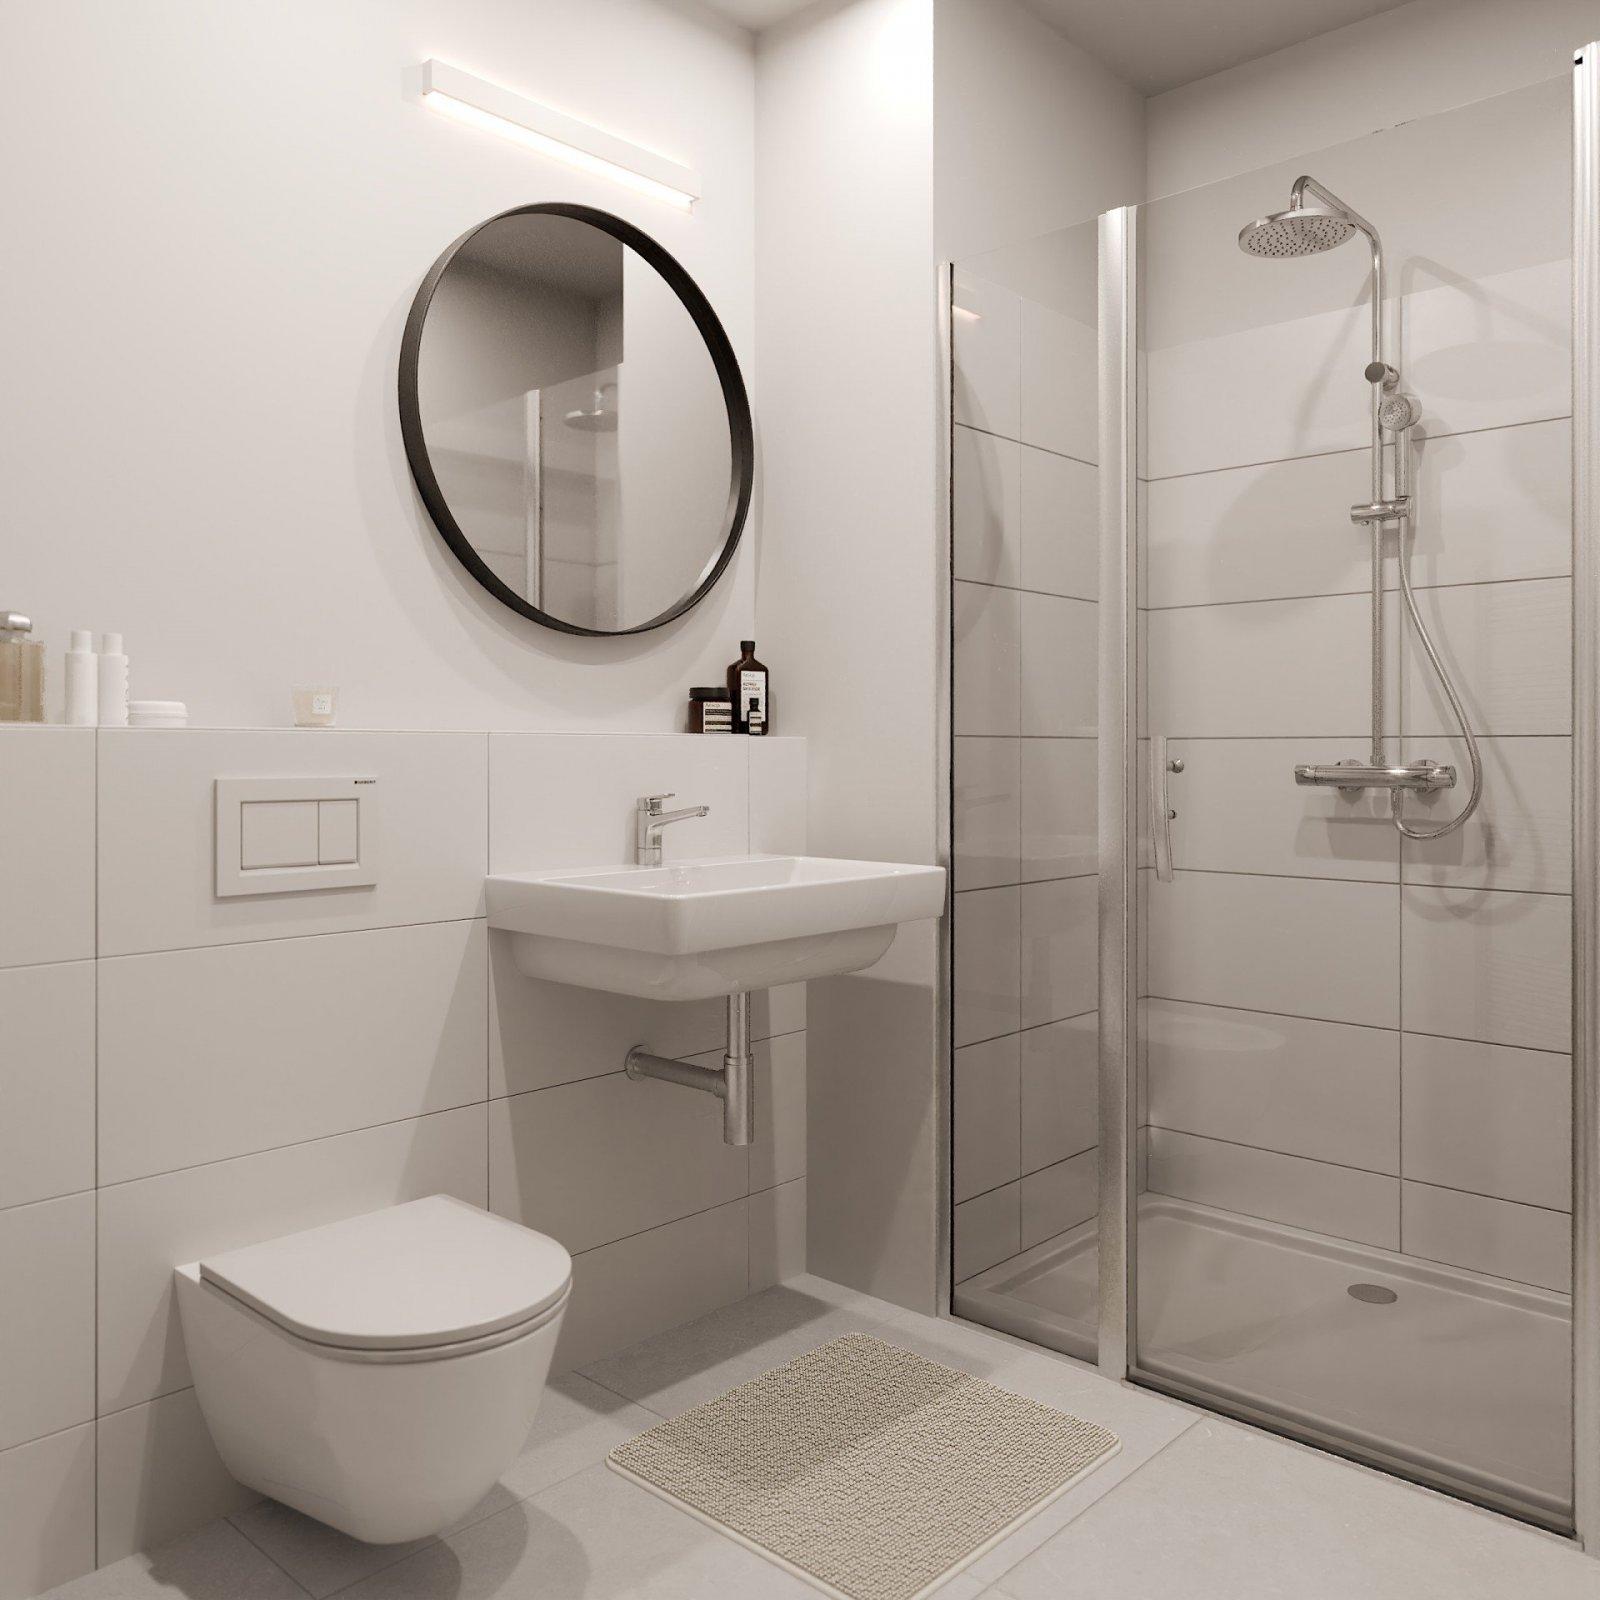 Půdní byt 2+1, plocha 72 m², ulice Bořivojova, Praha 3 - Žižkov, cena 8 450 000 Kč | 3